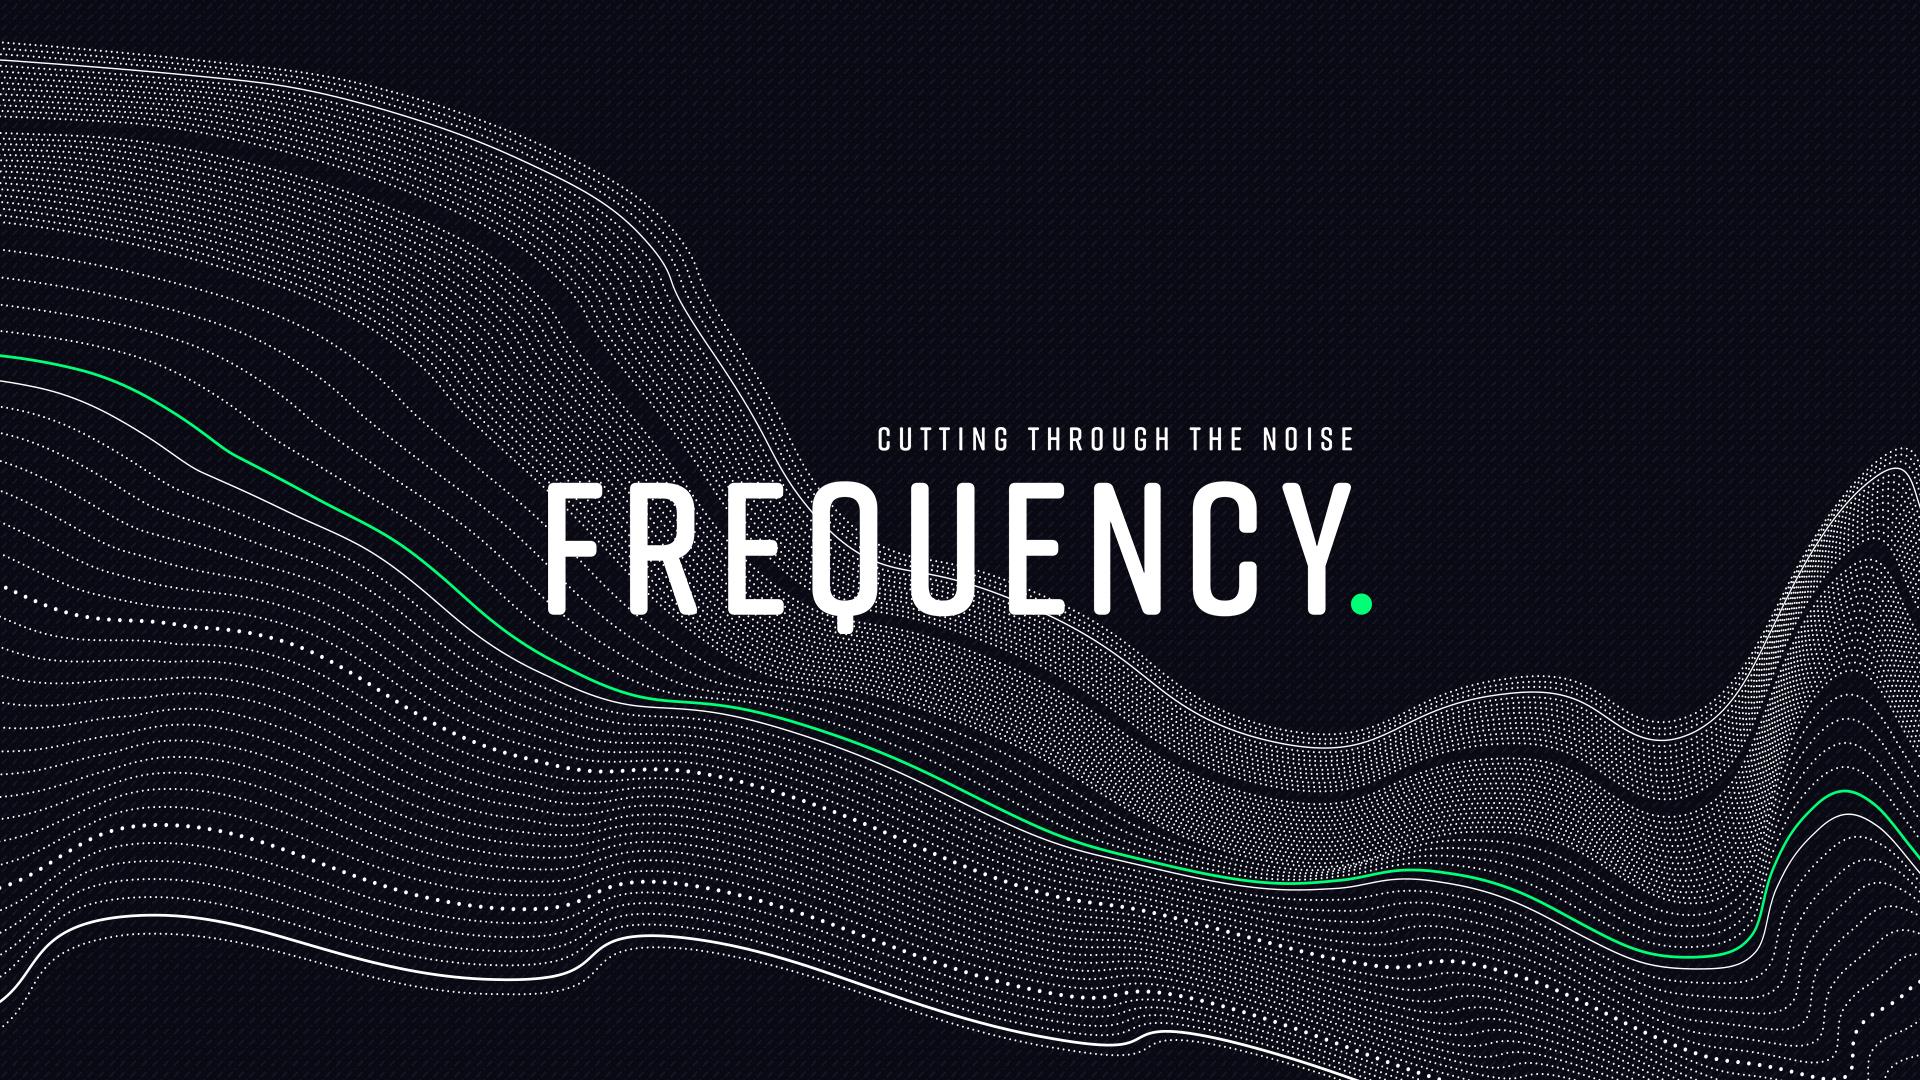 frequency-1920x1080.jpg